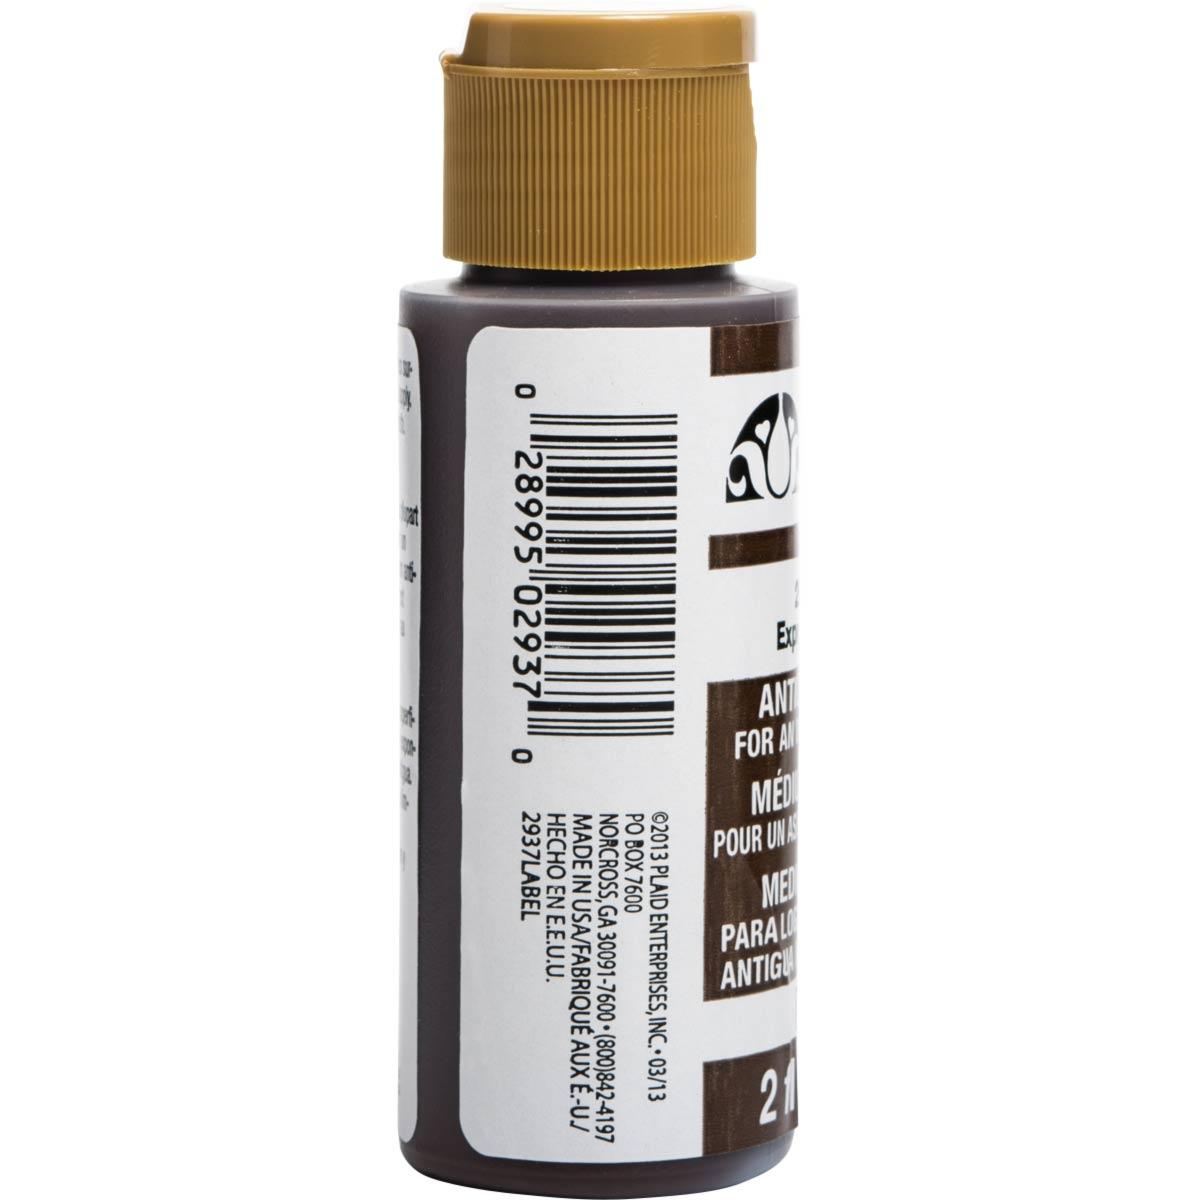 FolkArt ® Mediums - Antiquing Medium - Espresso, 2 oz. - 2937